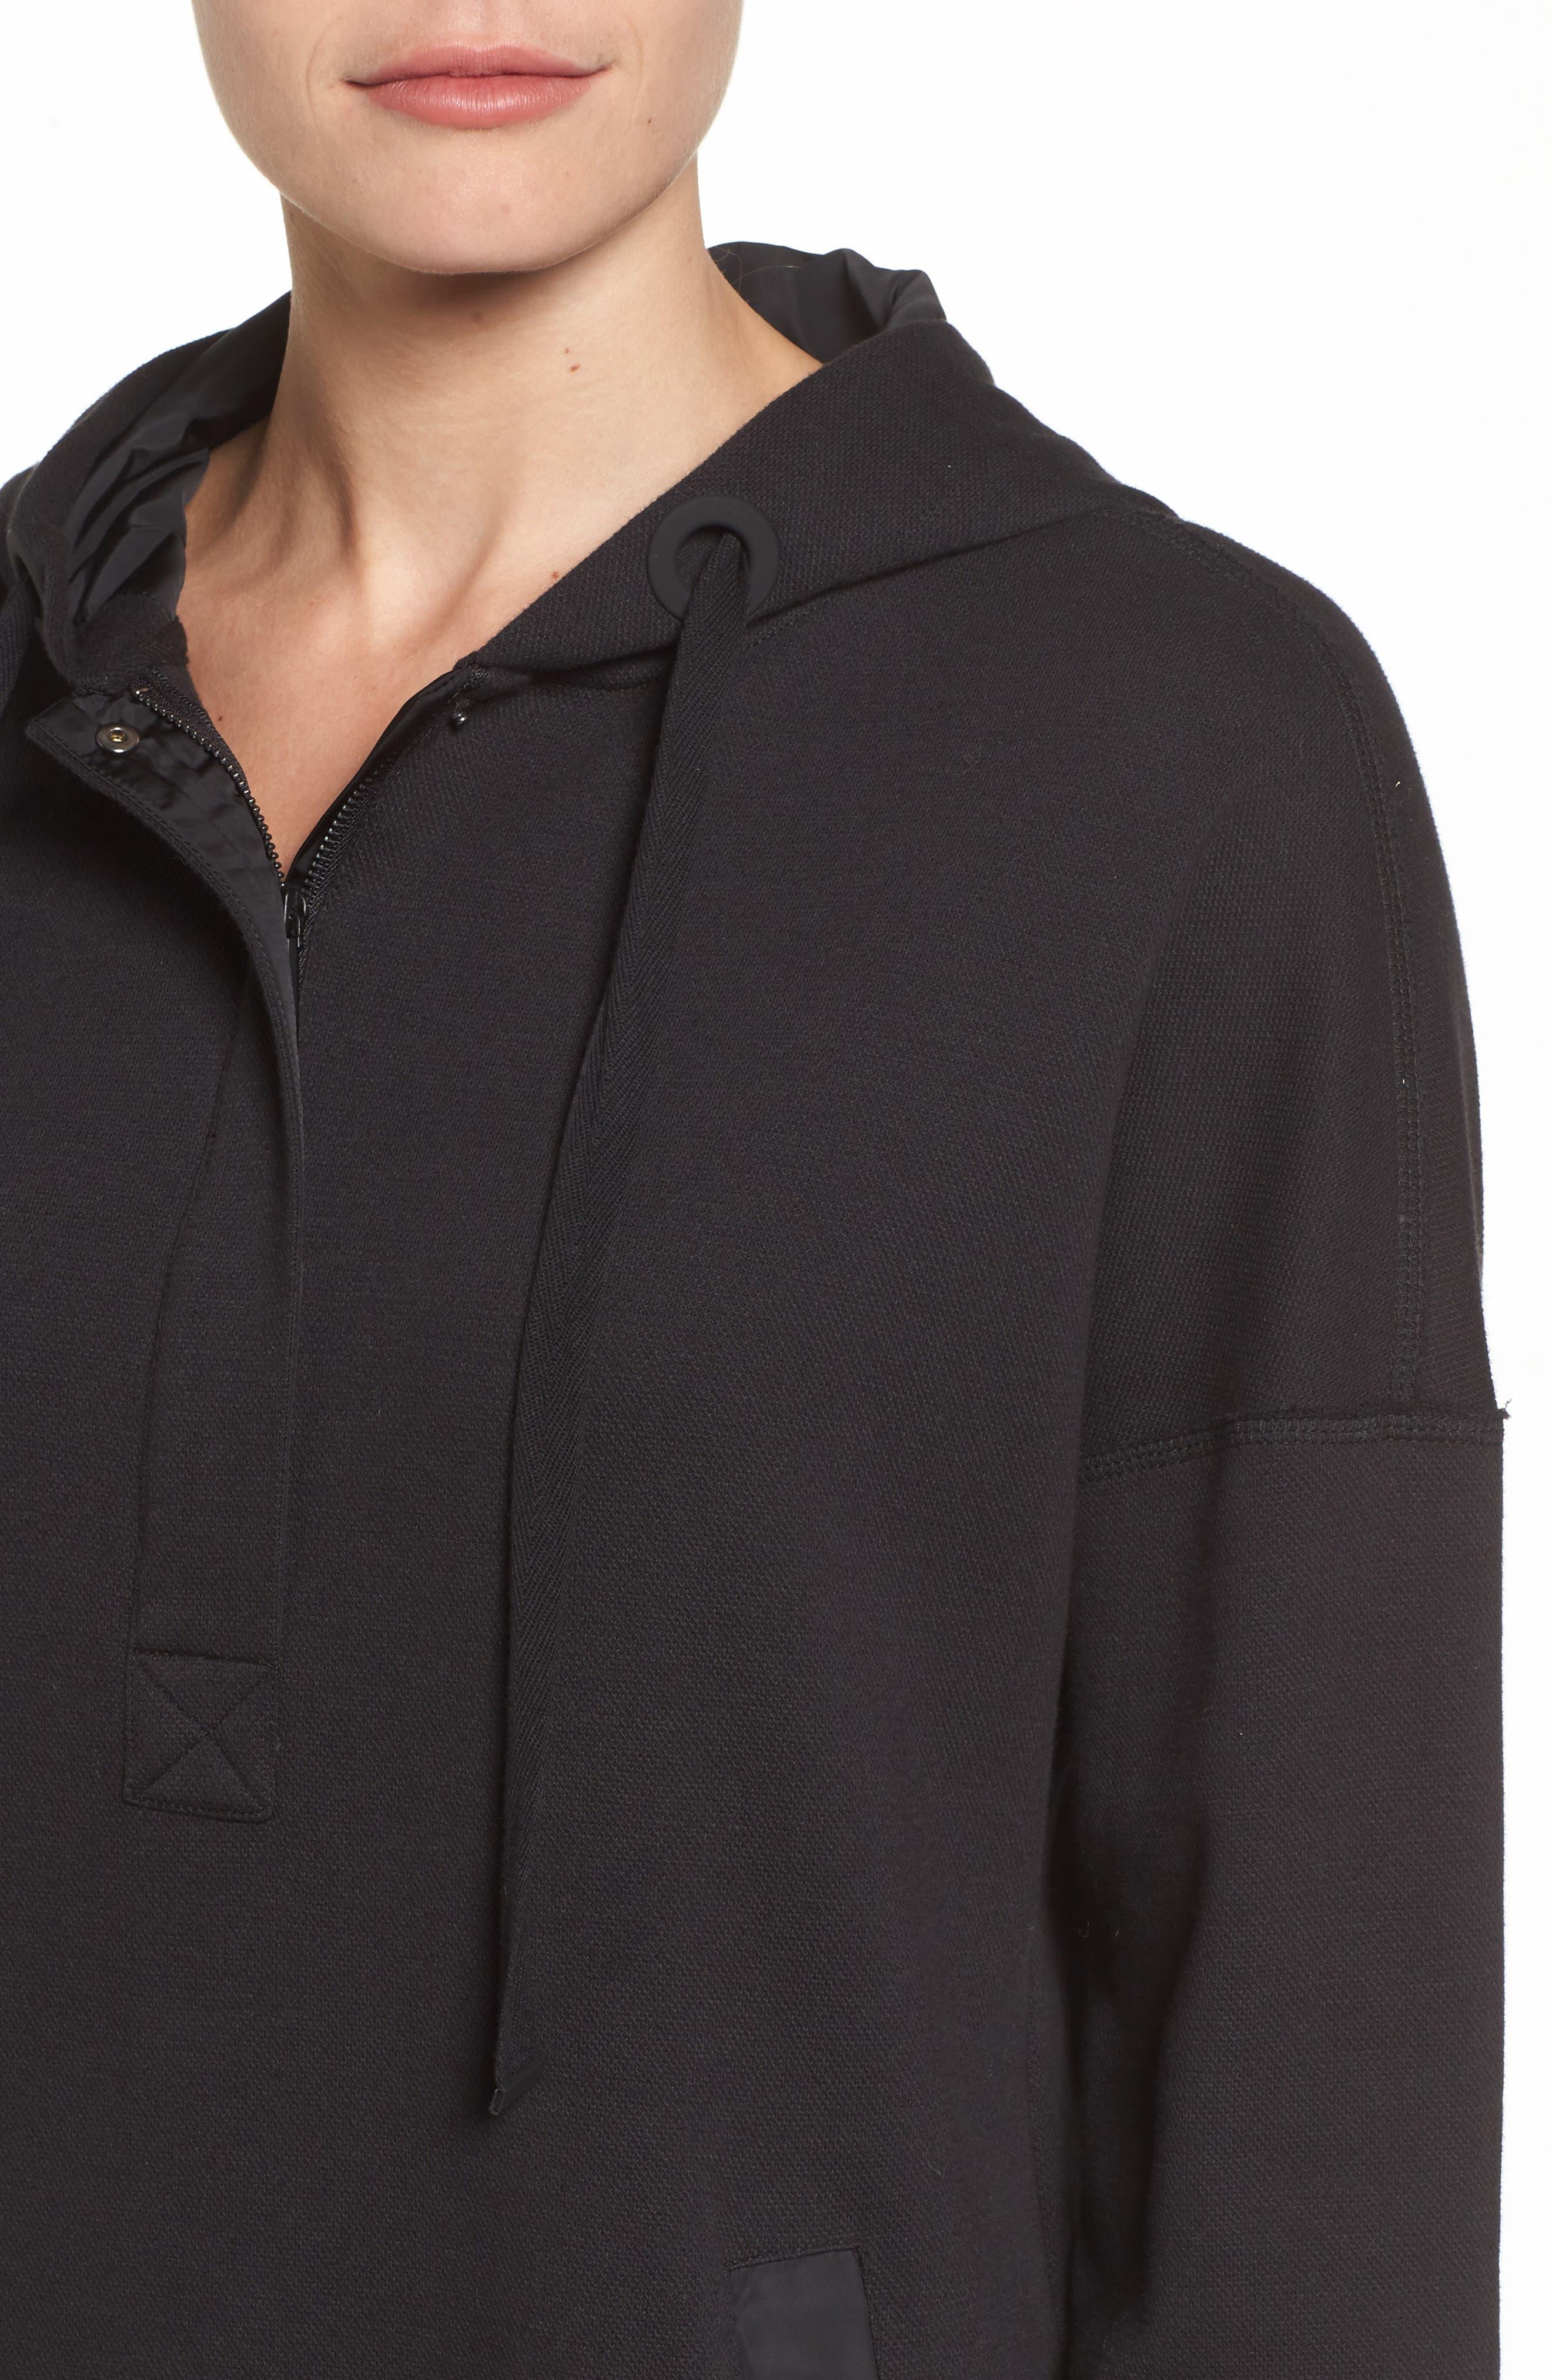 Hoodie Dress,                             Alternate thumbnail 4, color,                             Black